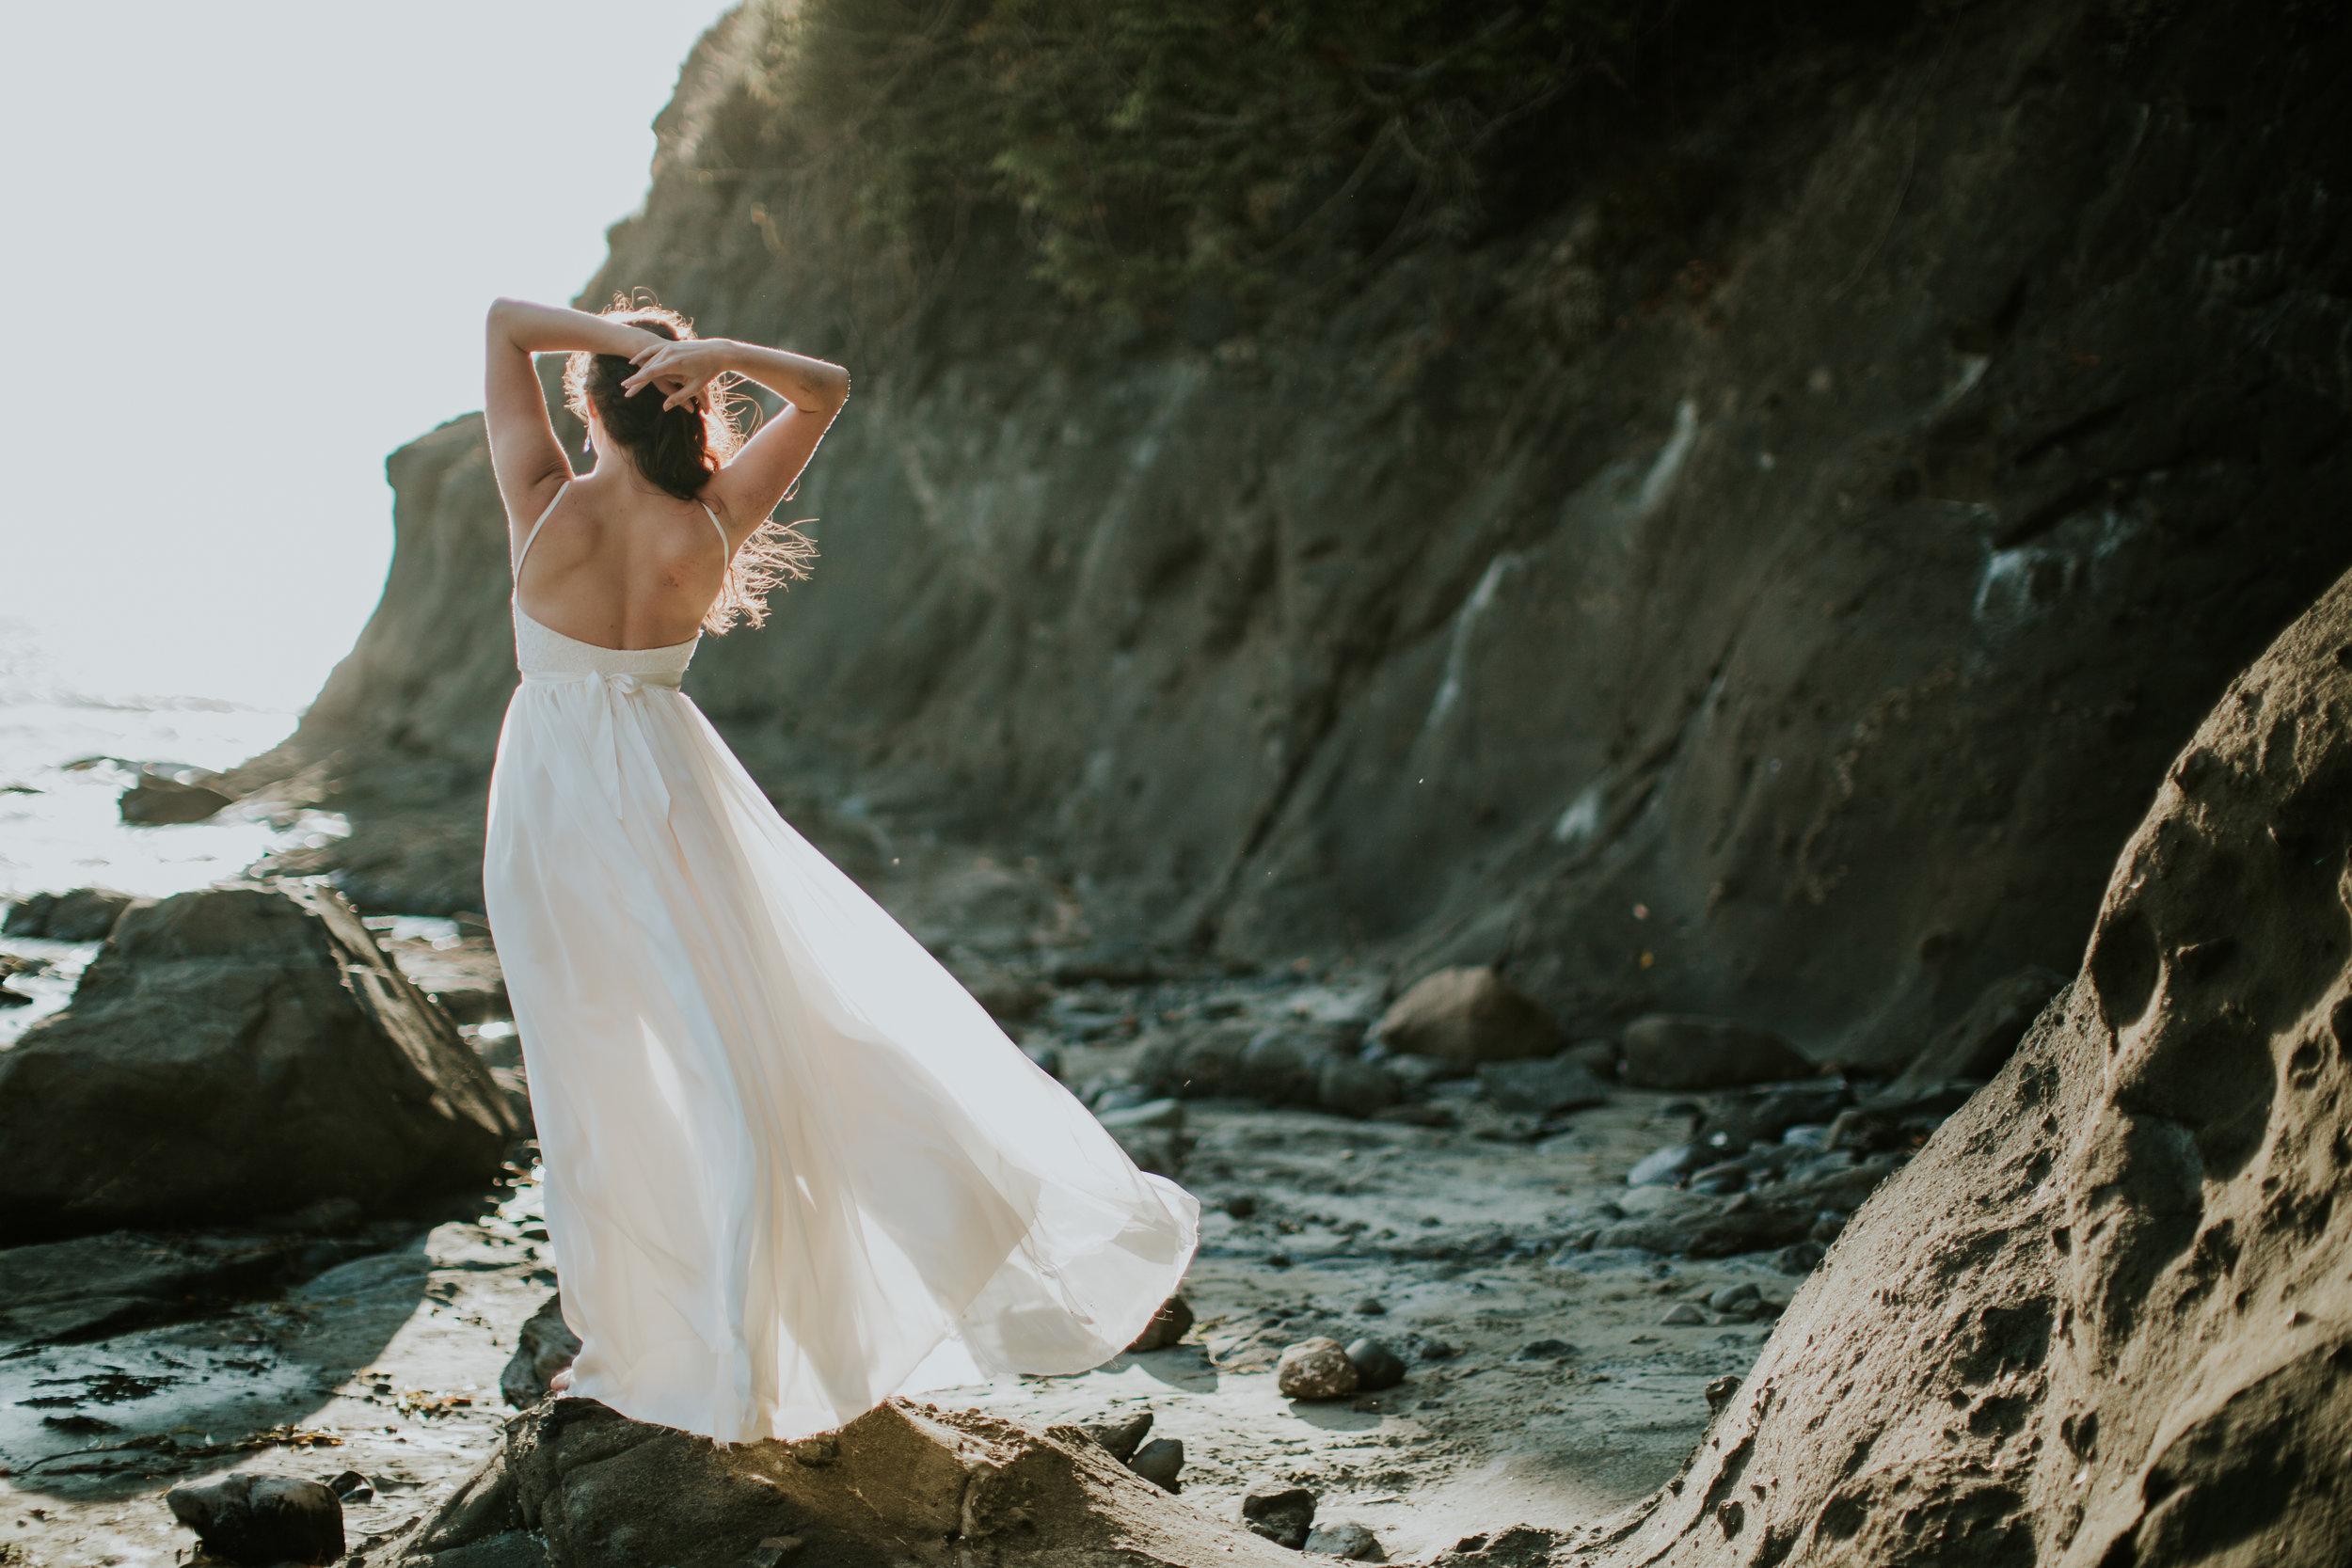 Port-Angeles-Salt-Creek-beach-wedding-bride-PNW-olympic-peninsula-photographer-Kayla-Dawn-Photography-outdoors-golden-hour-dancer-dress (12).jpg